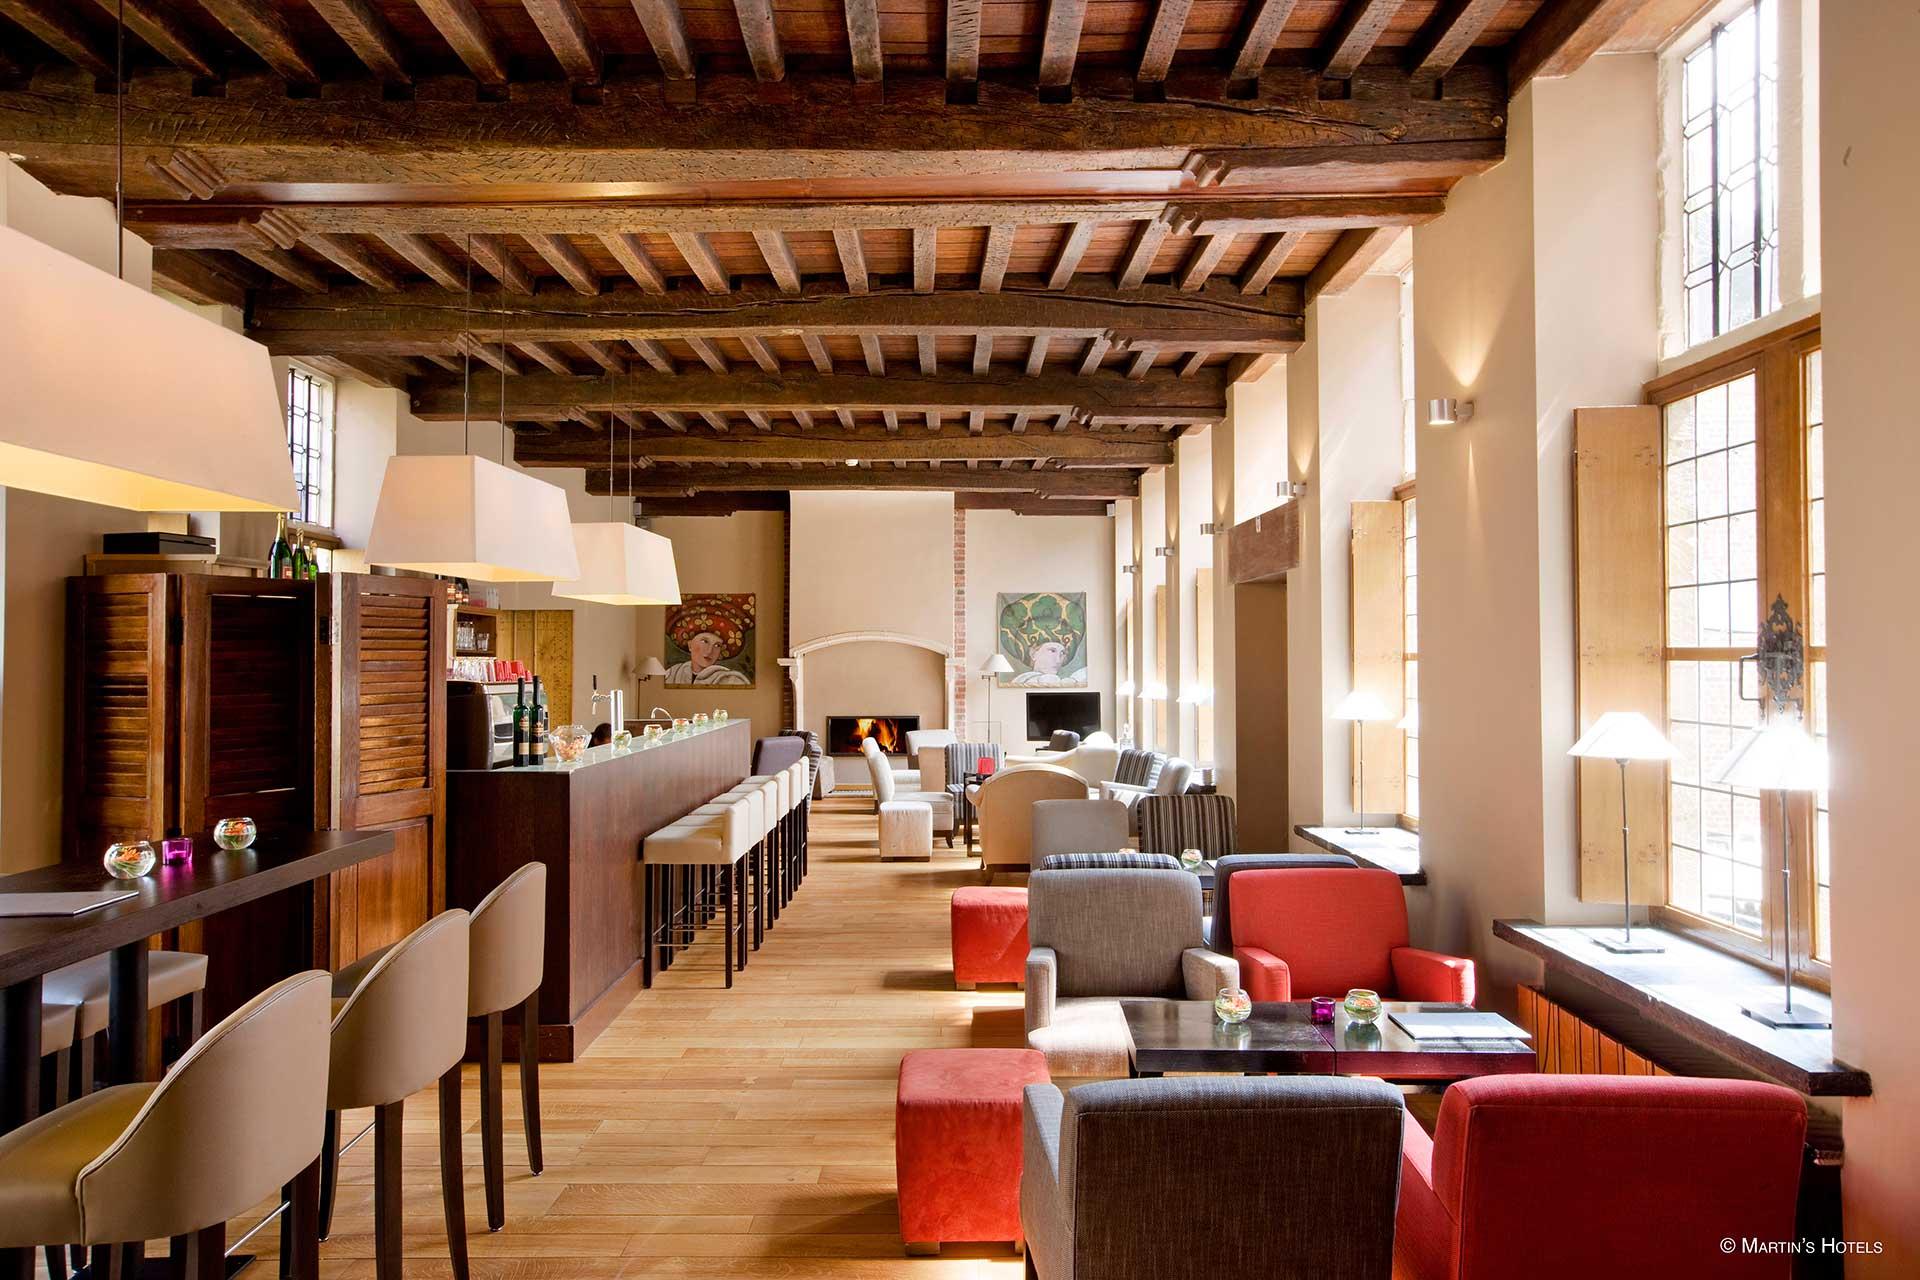 Golfexpedition-Golfreizen-België-Brussel-Klooster-Leuven-course-restaurant